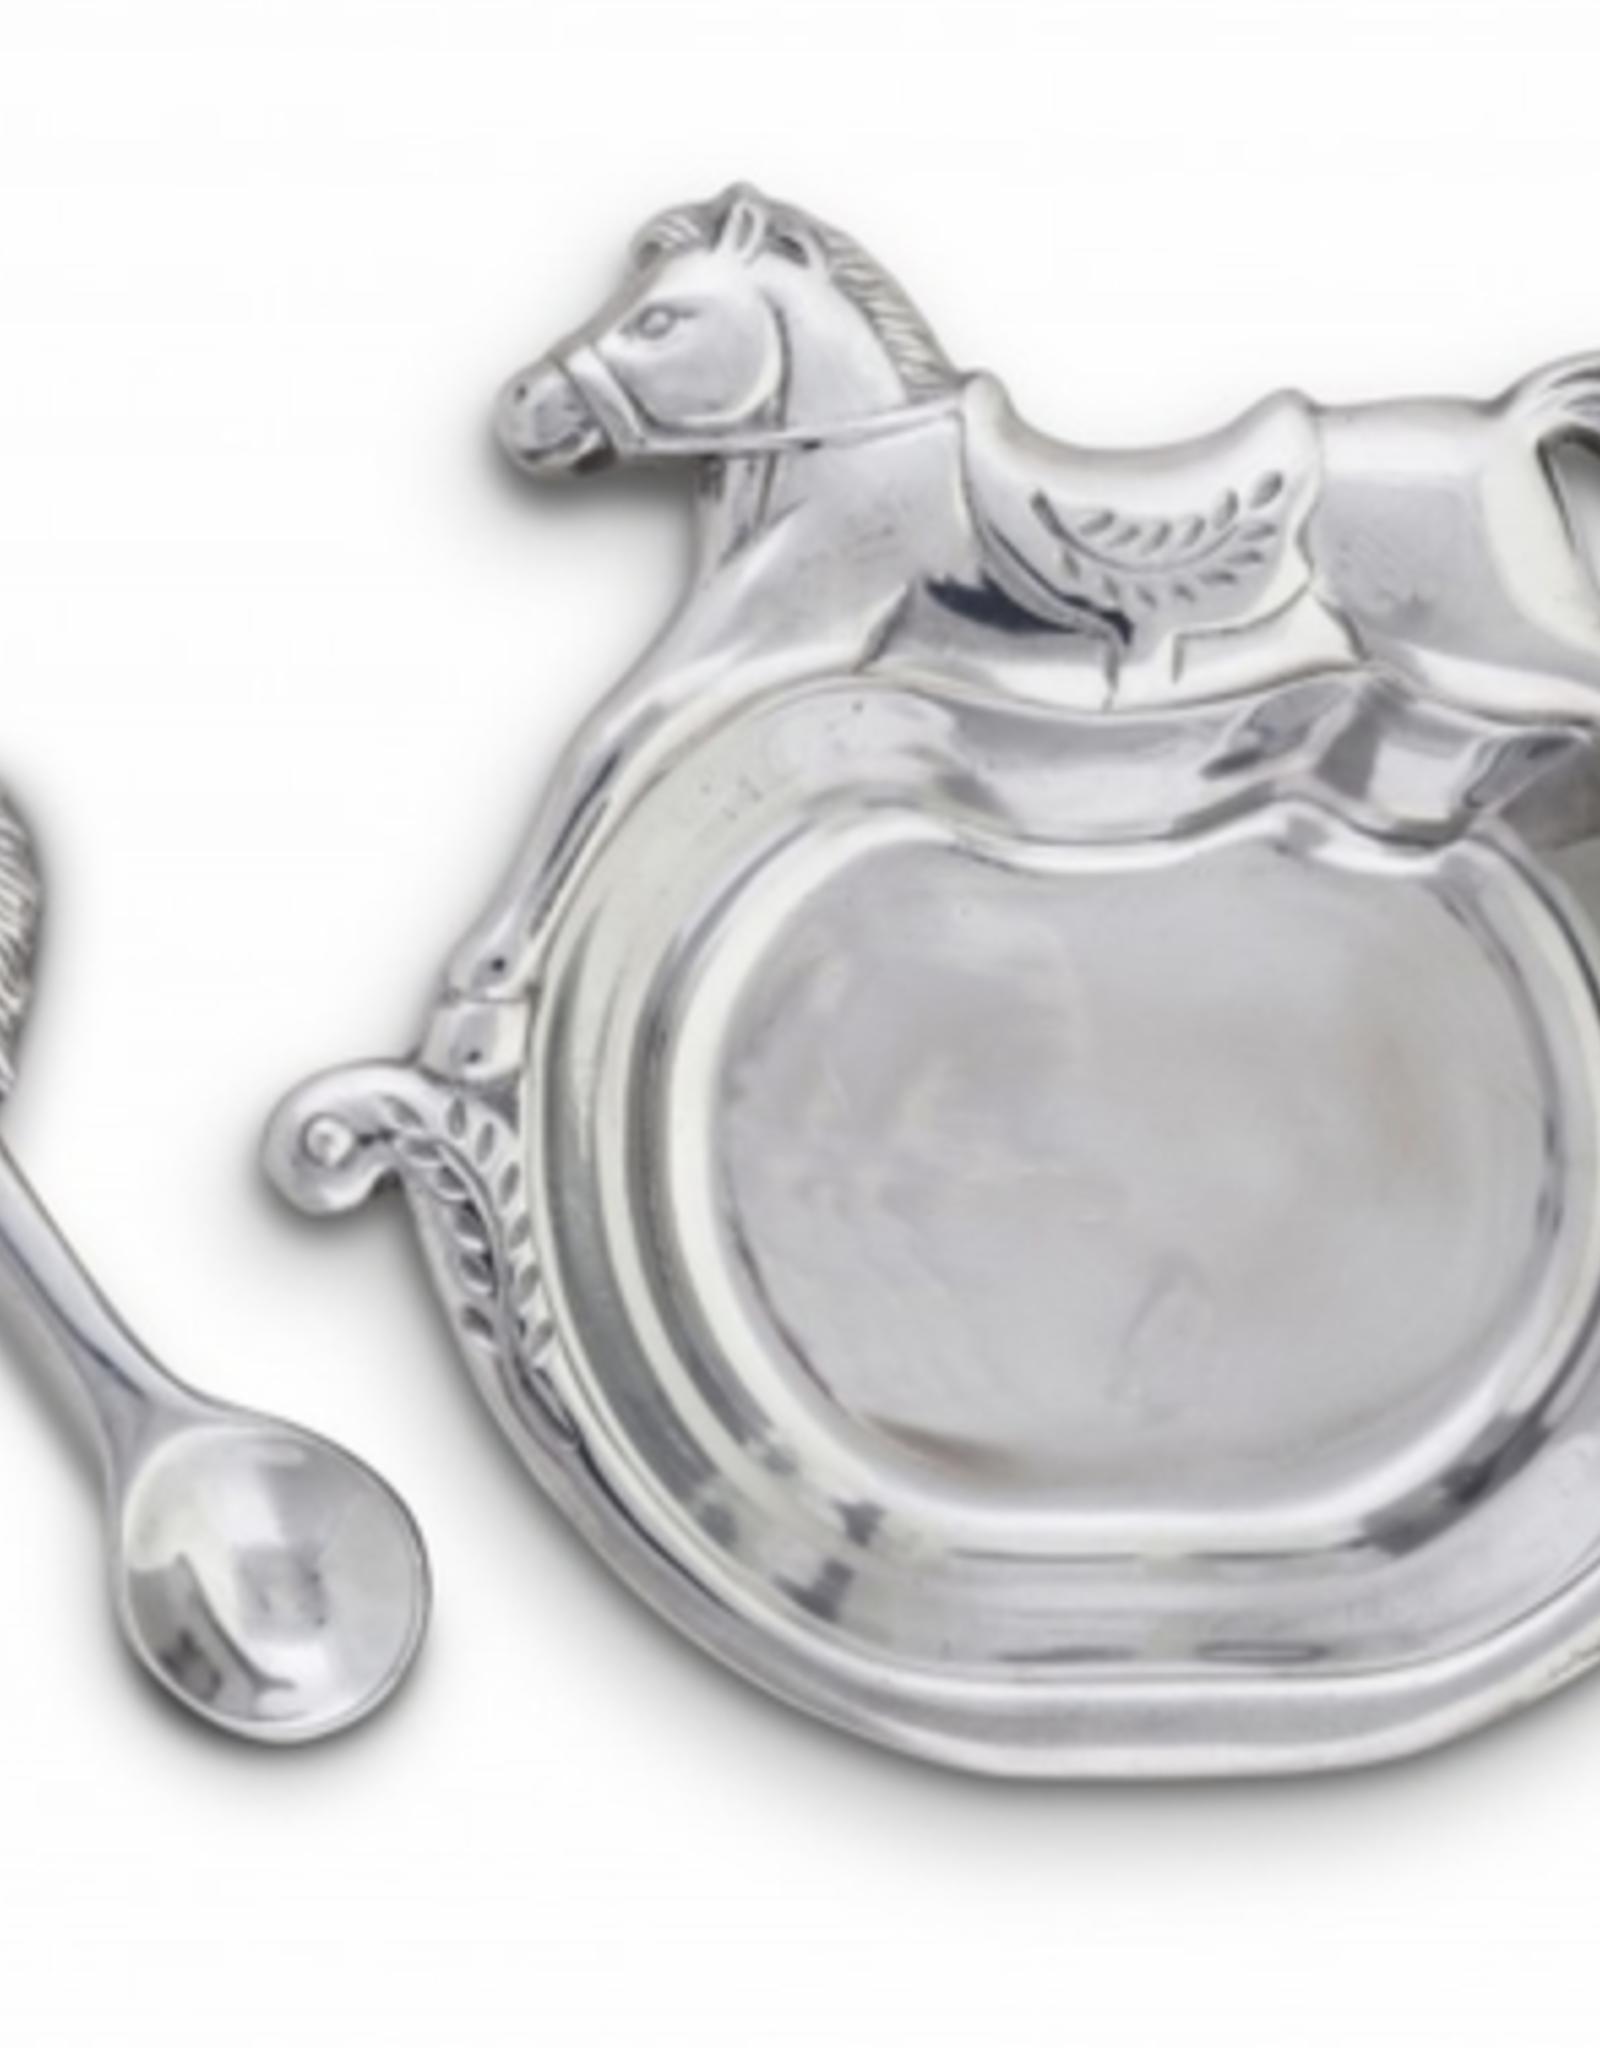 Arthur Court Arthur Court Rocking Horse Plate & Spoon Keepsake Set